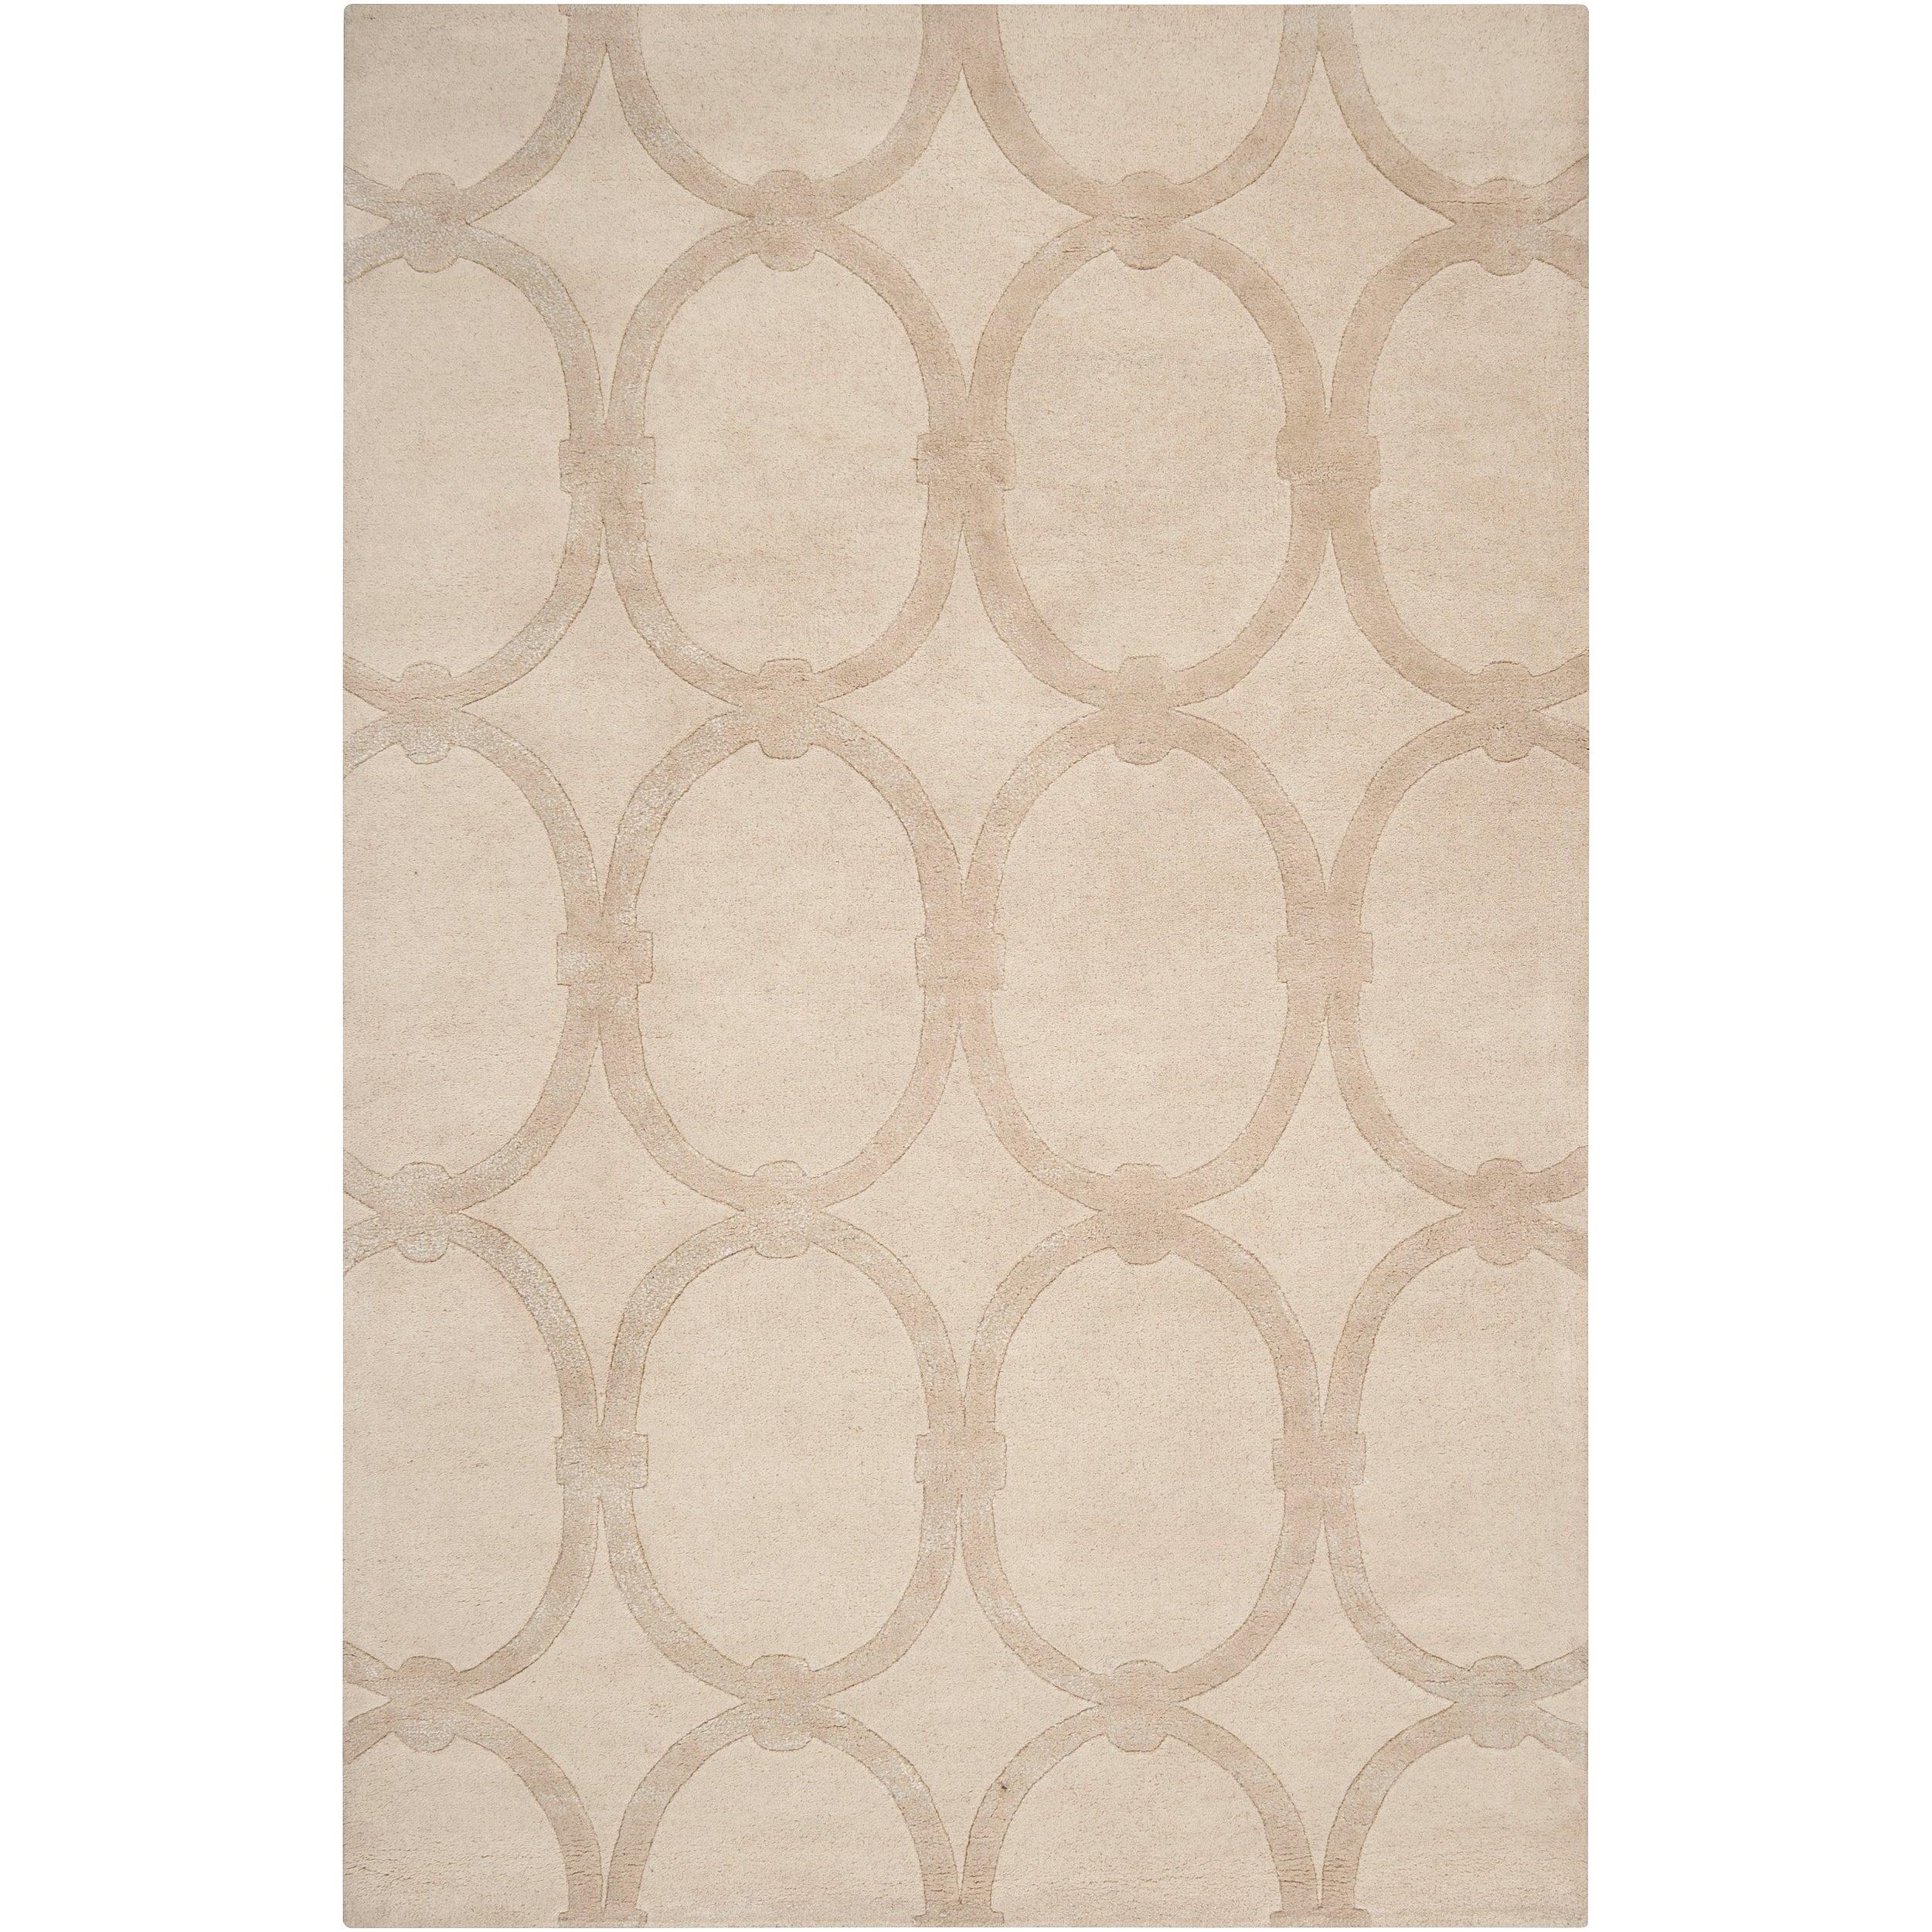 Hand-tufted Beige Alhambra Trellis Pattern Wool Area Rug (3'3 x 5'3)